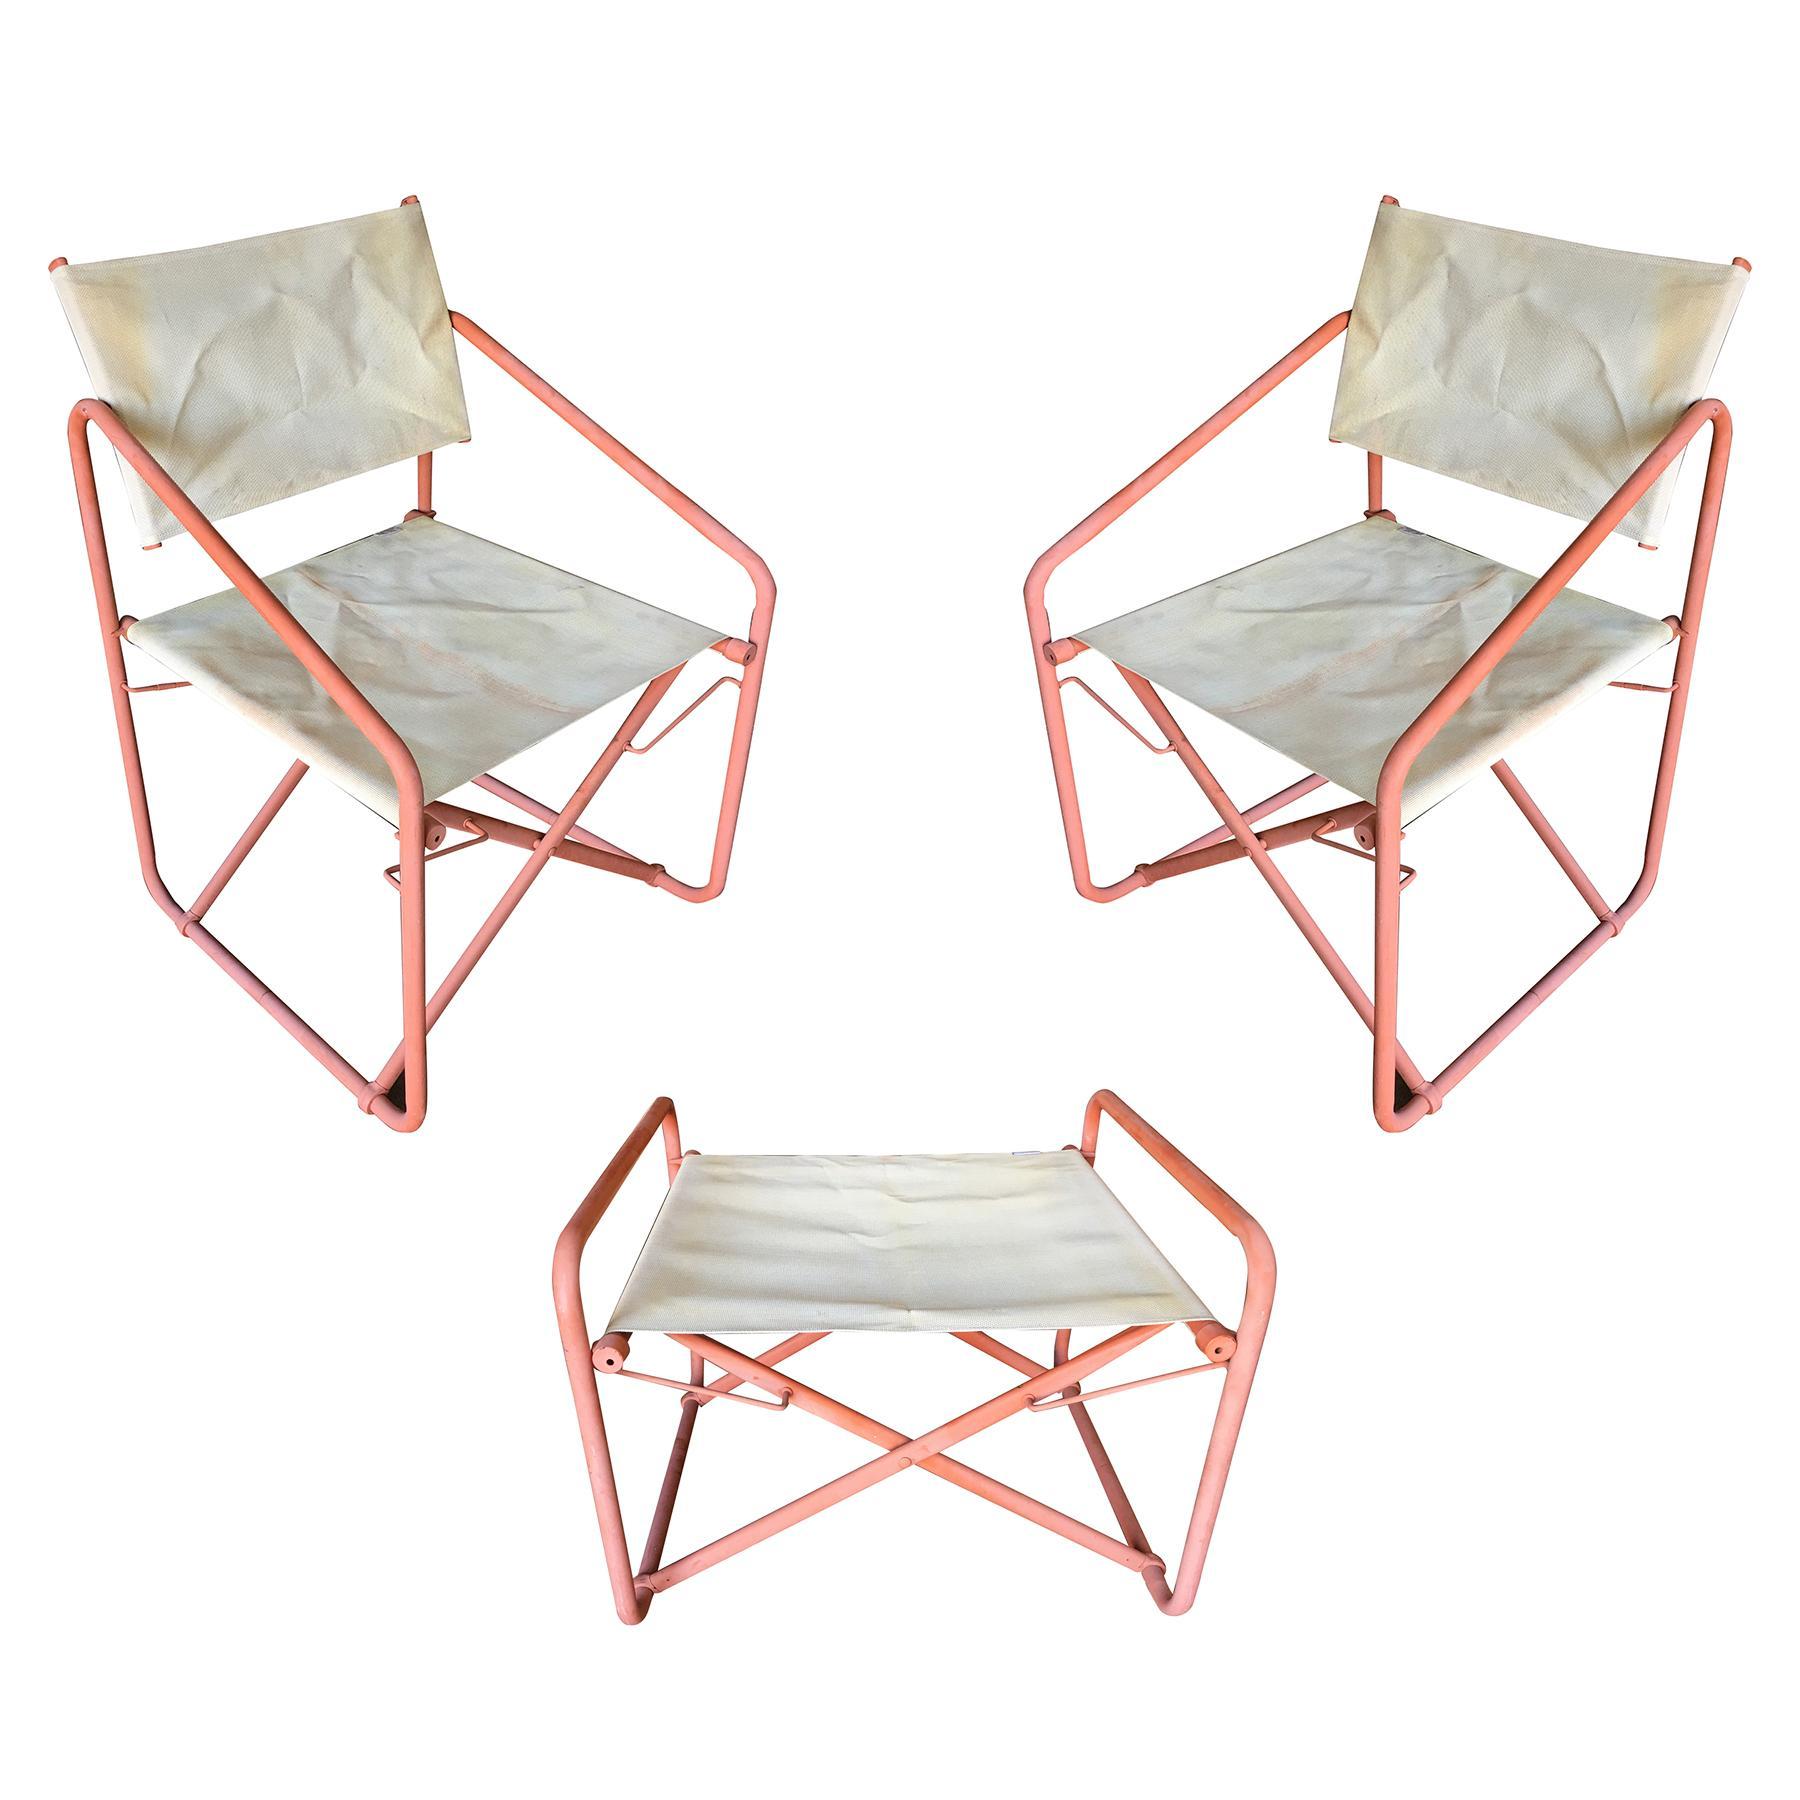 Incredible Brown Jordan Furniture 76 For Sale At 1Stdibs Home Remodeling Inspirations Cosmcuboardxyz